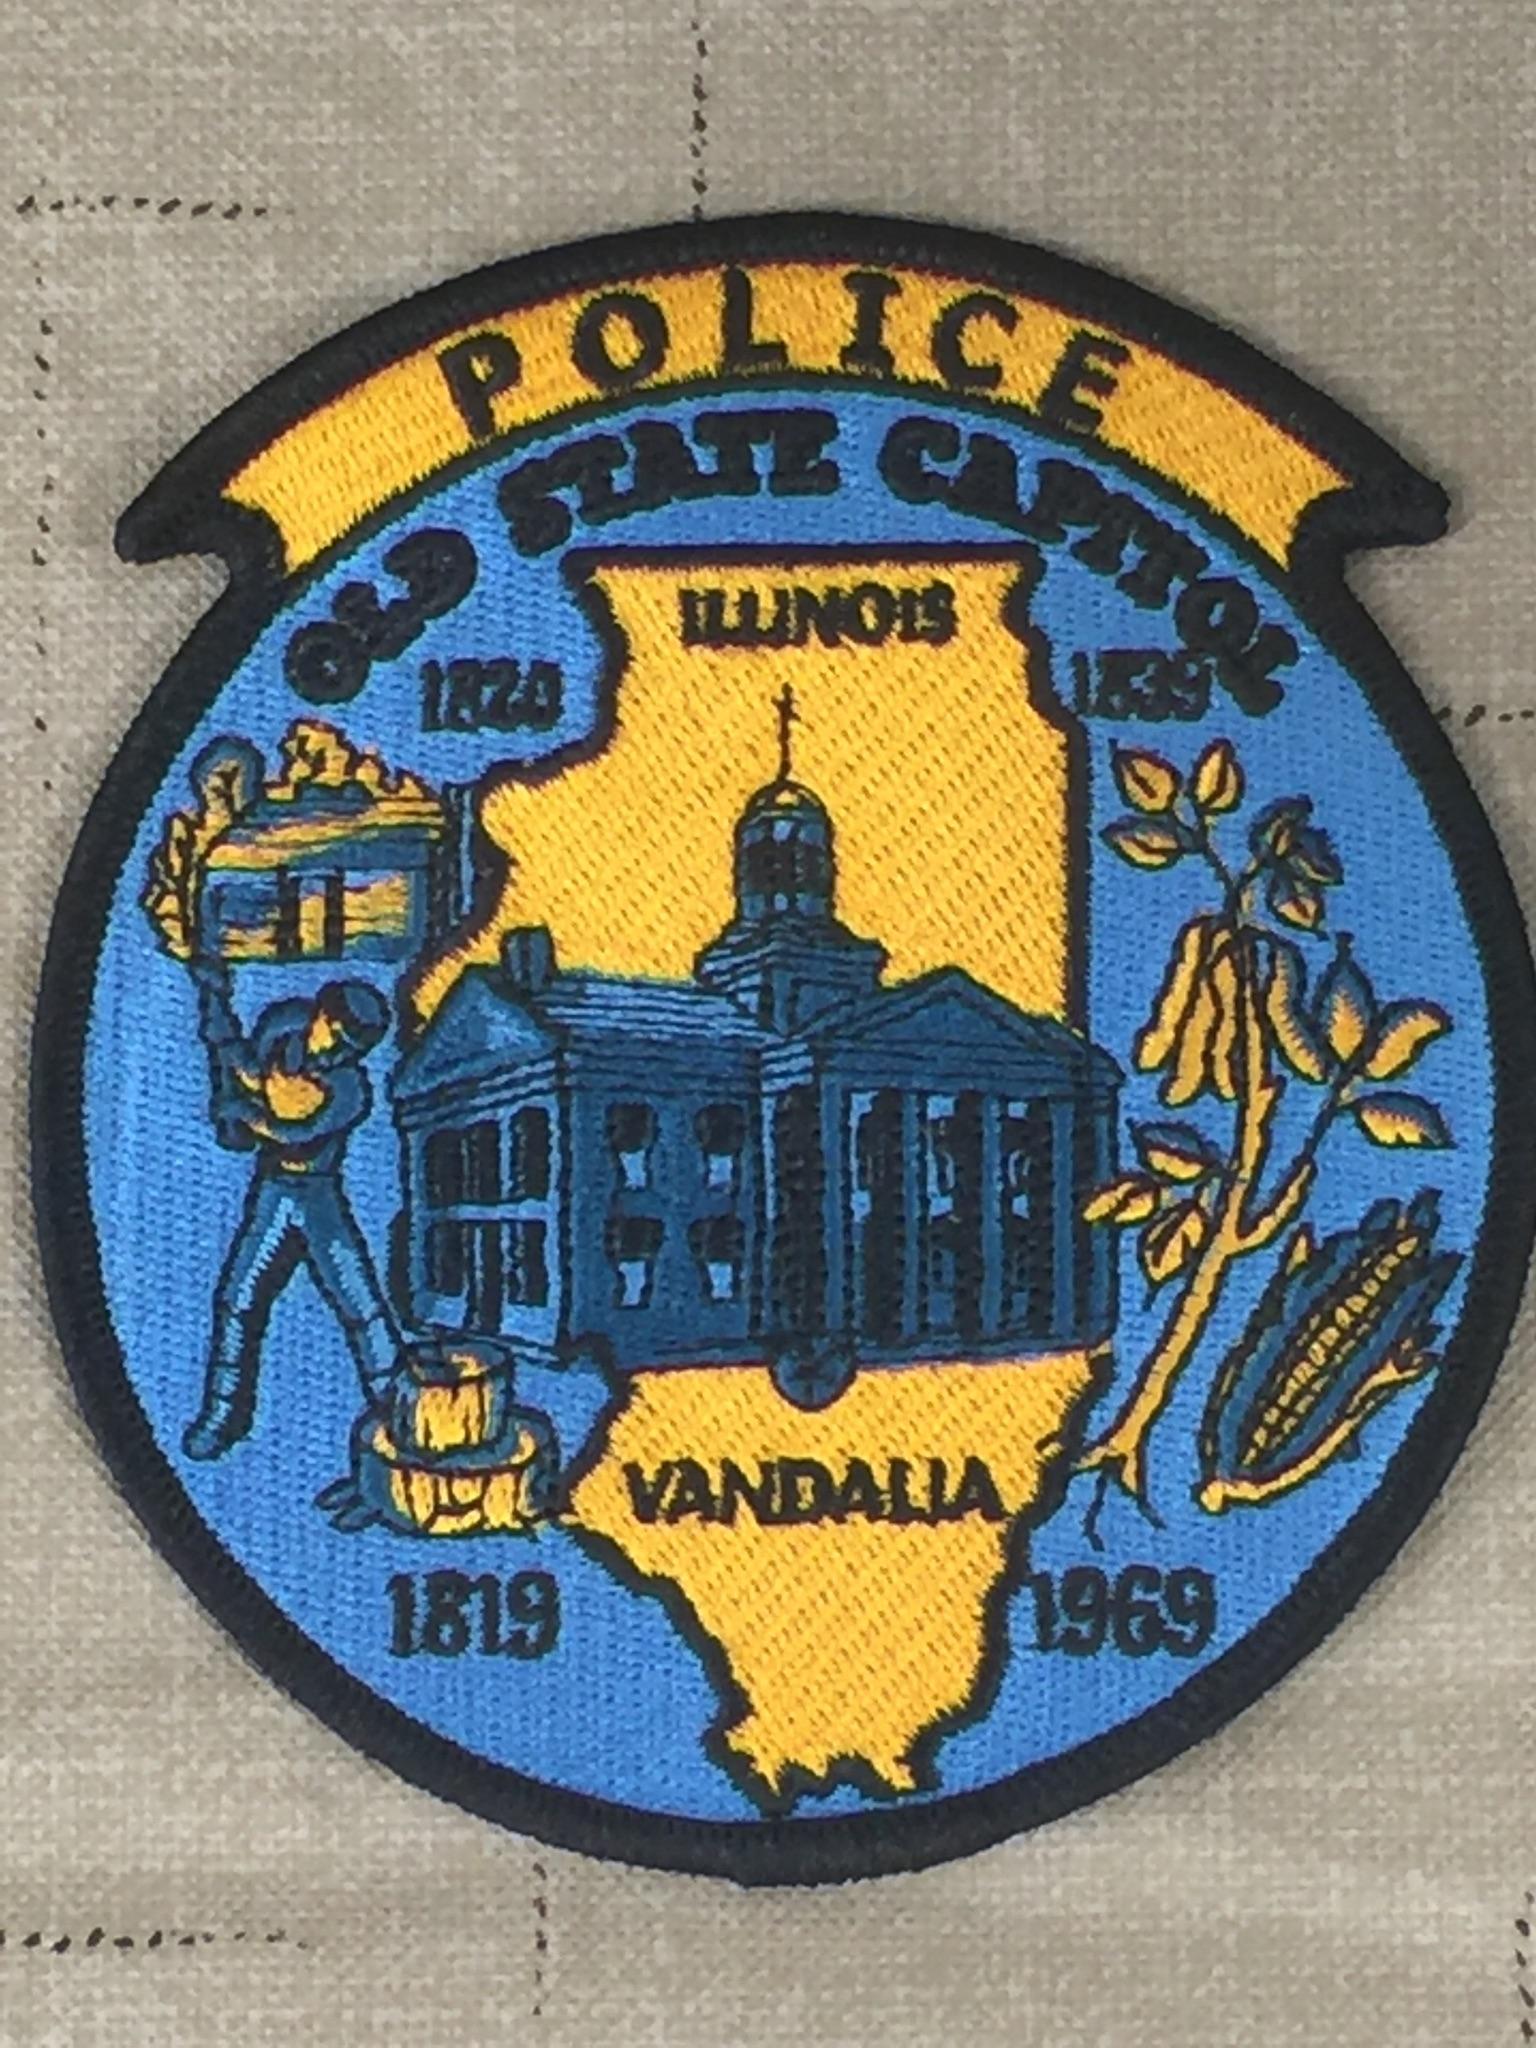 Three Juveniles in custody following a rash of Vandalia burglaries over the weekend